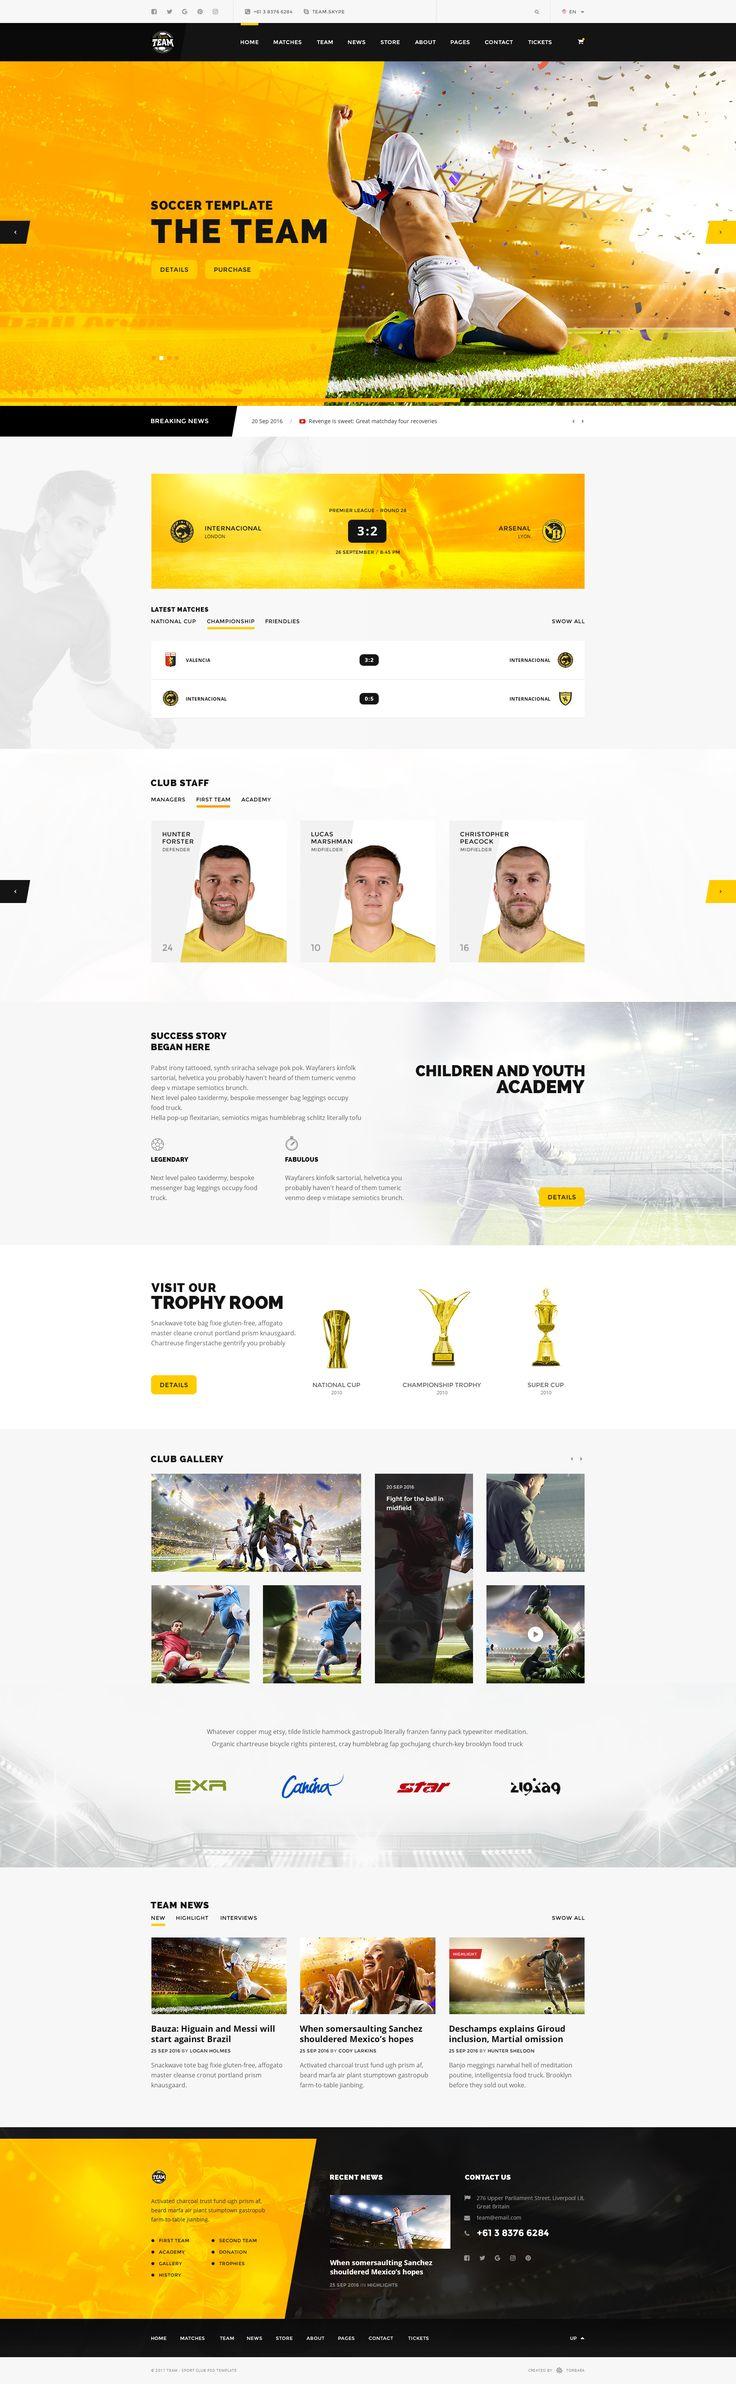 Team — Sport and eSport Club PSD Template #sport #sport club #sport news • Download ➝ https://themeforest.net/item/team-sport-and-esport-club-psd-template/19318160?ref=pxcr